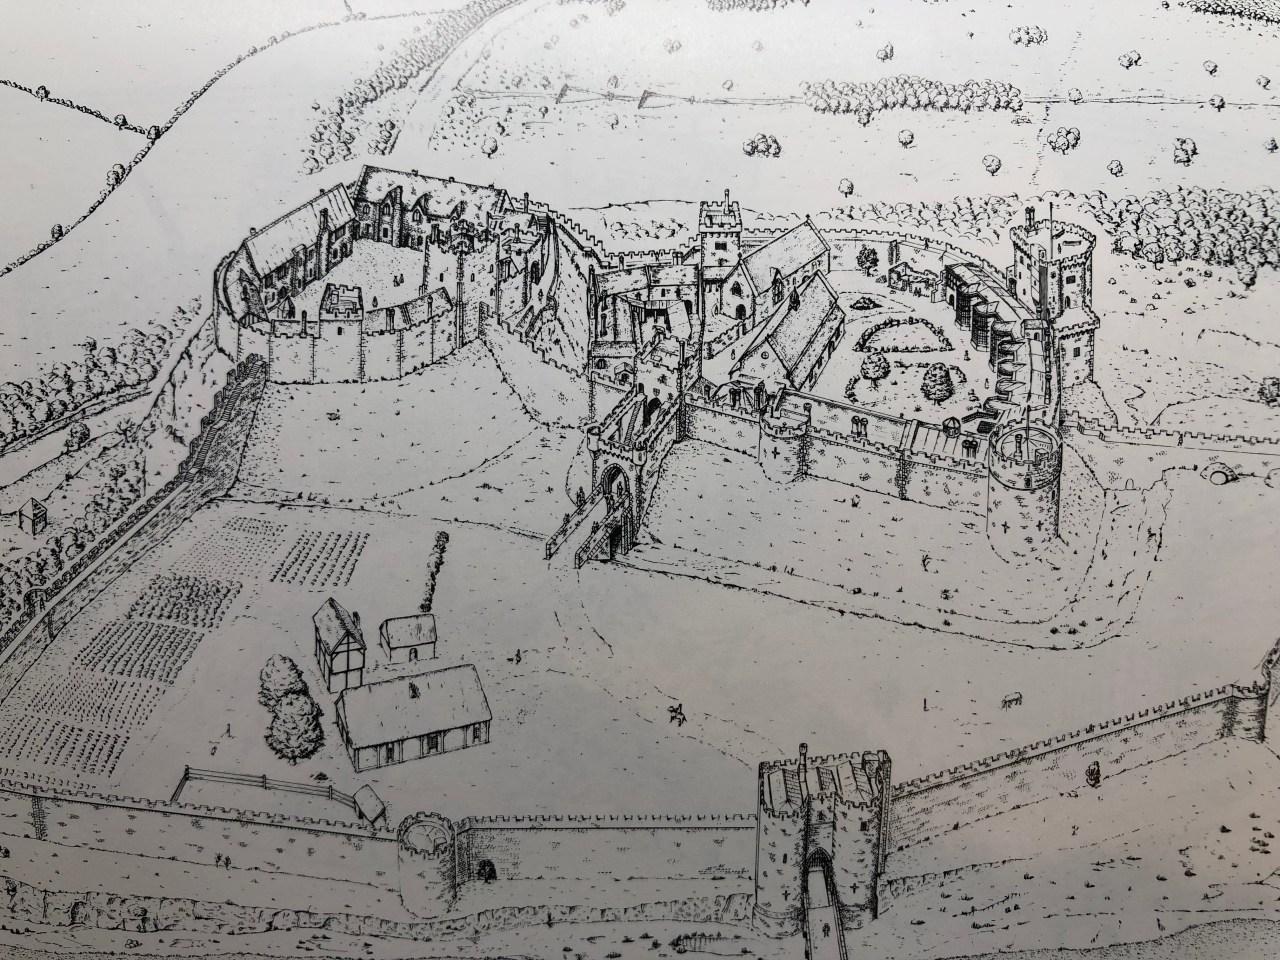 Reconstruction of Nottingham Castle circa 1500